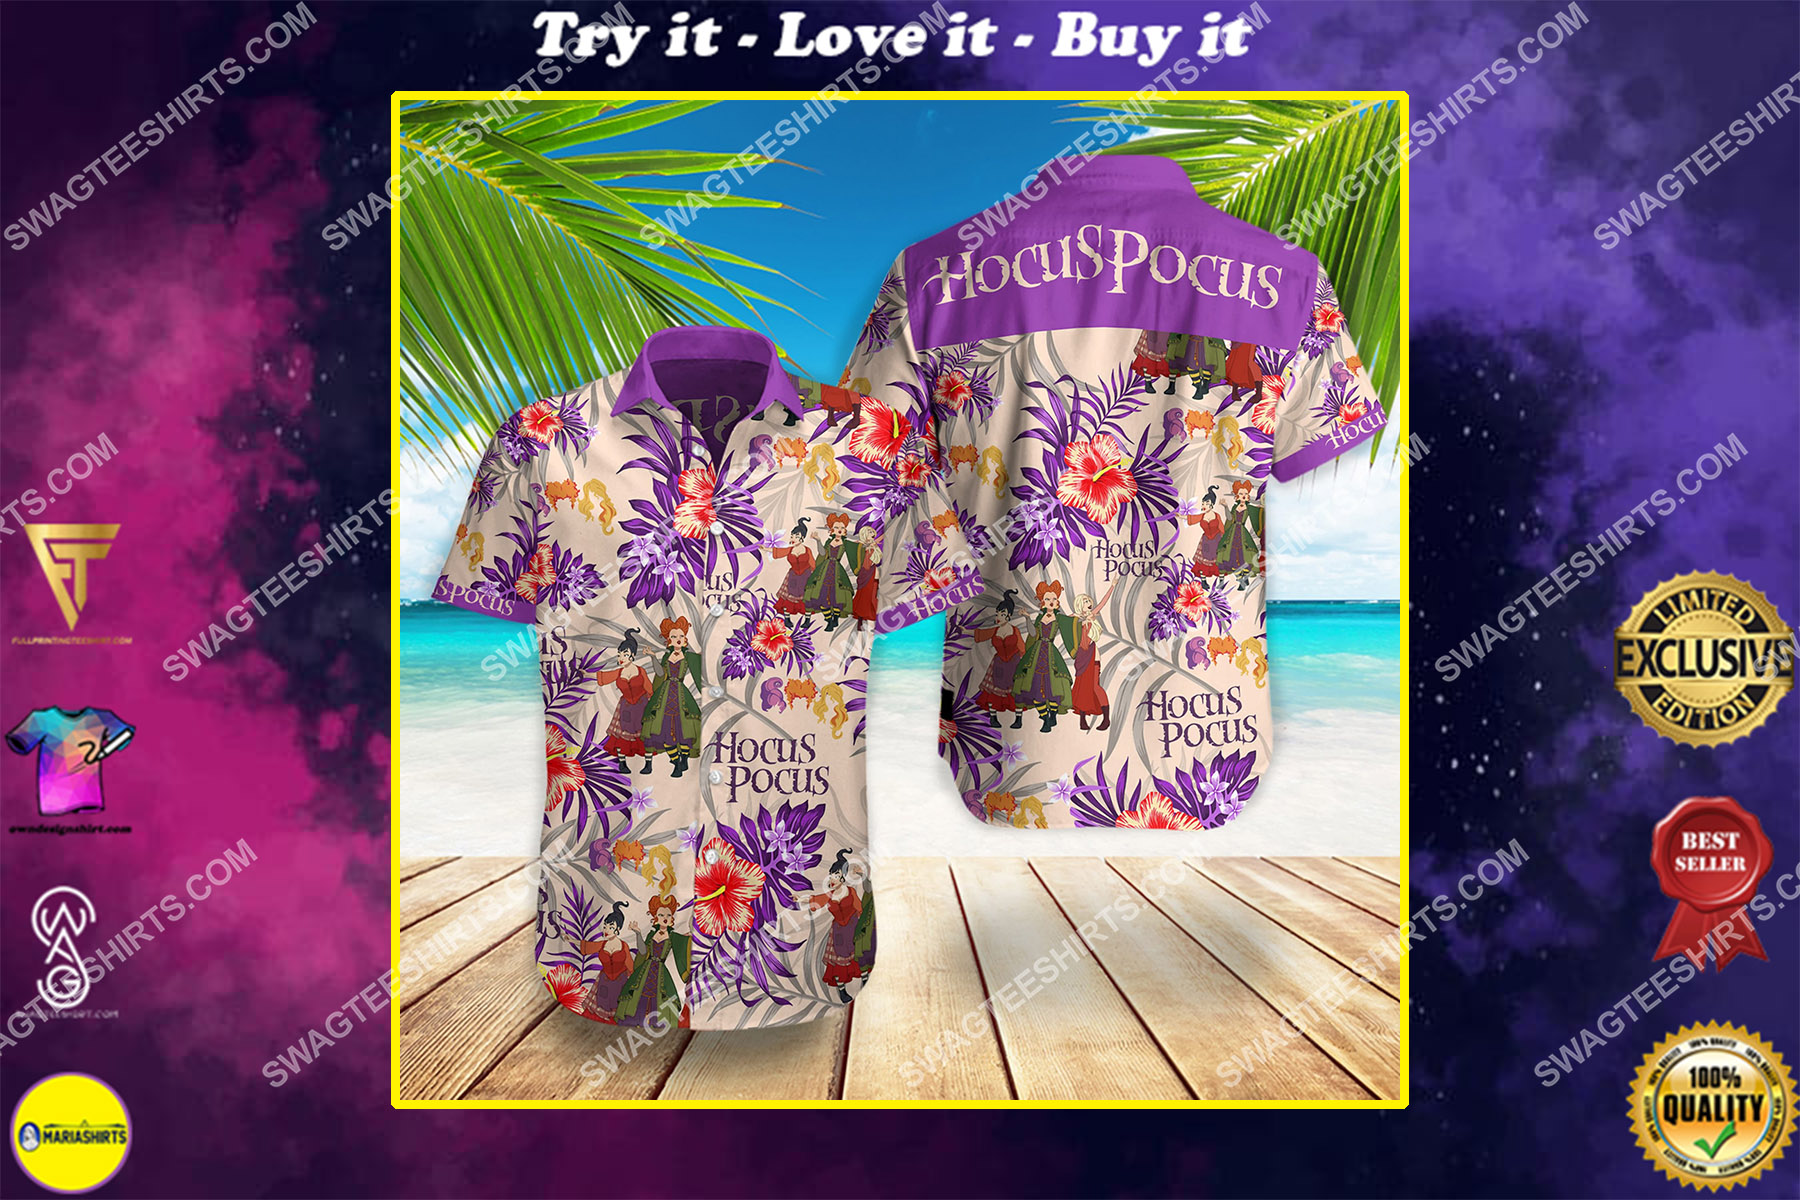 hocus pocus movie all over print hawaiian shirt